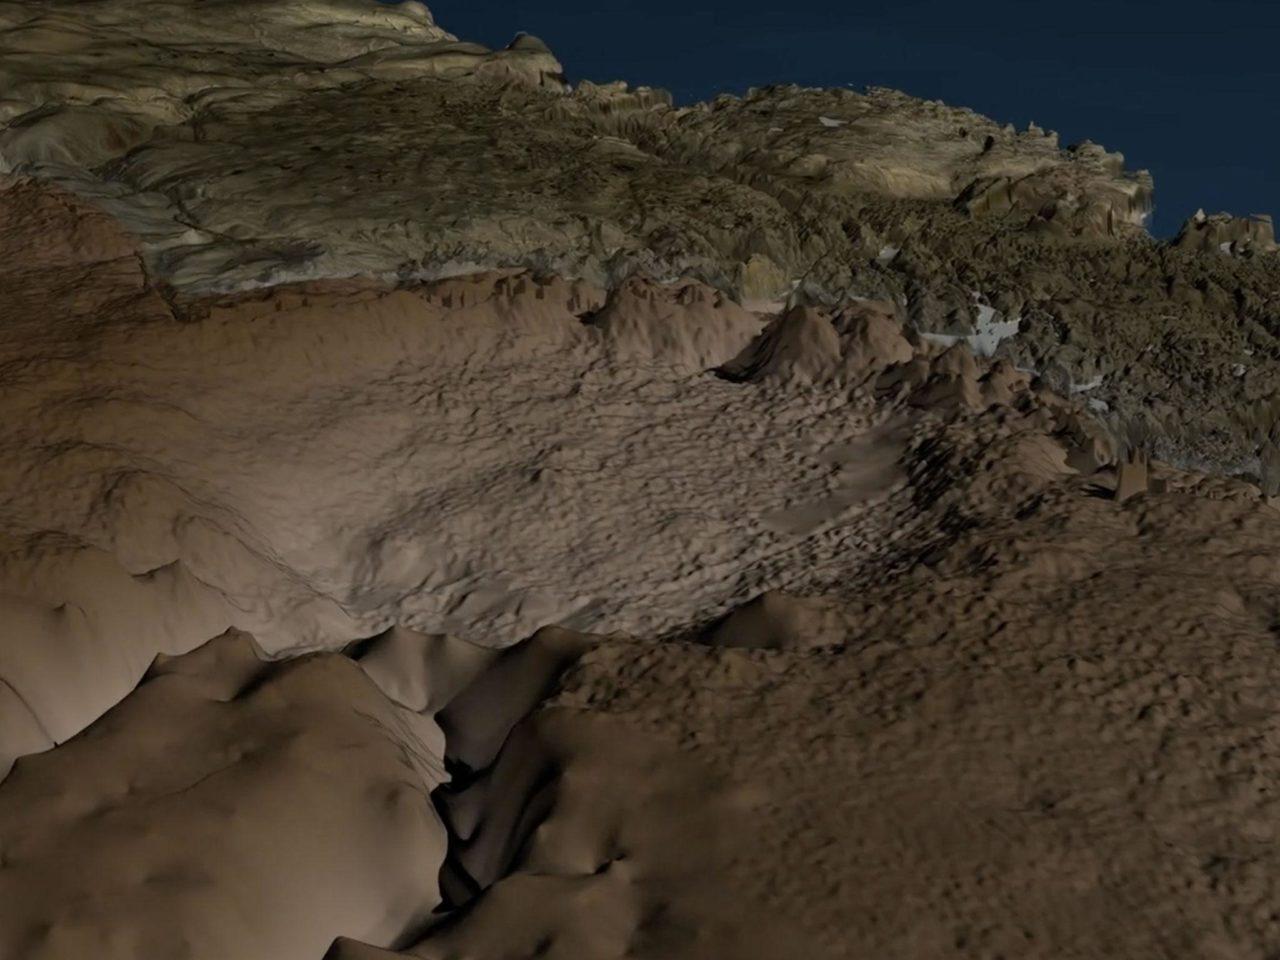 Giant meteorite crater bigger than Paris found beneath Greenland's ice sheet